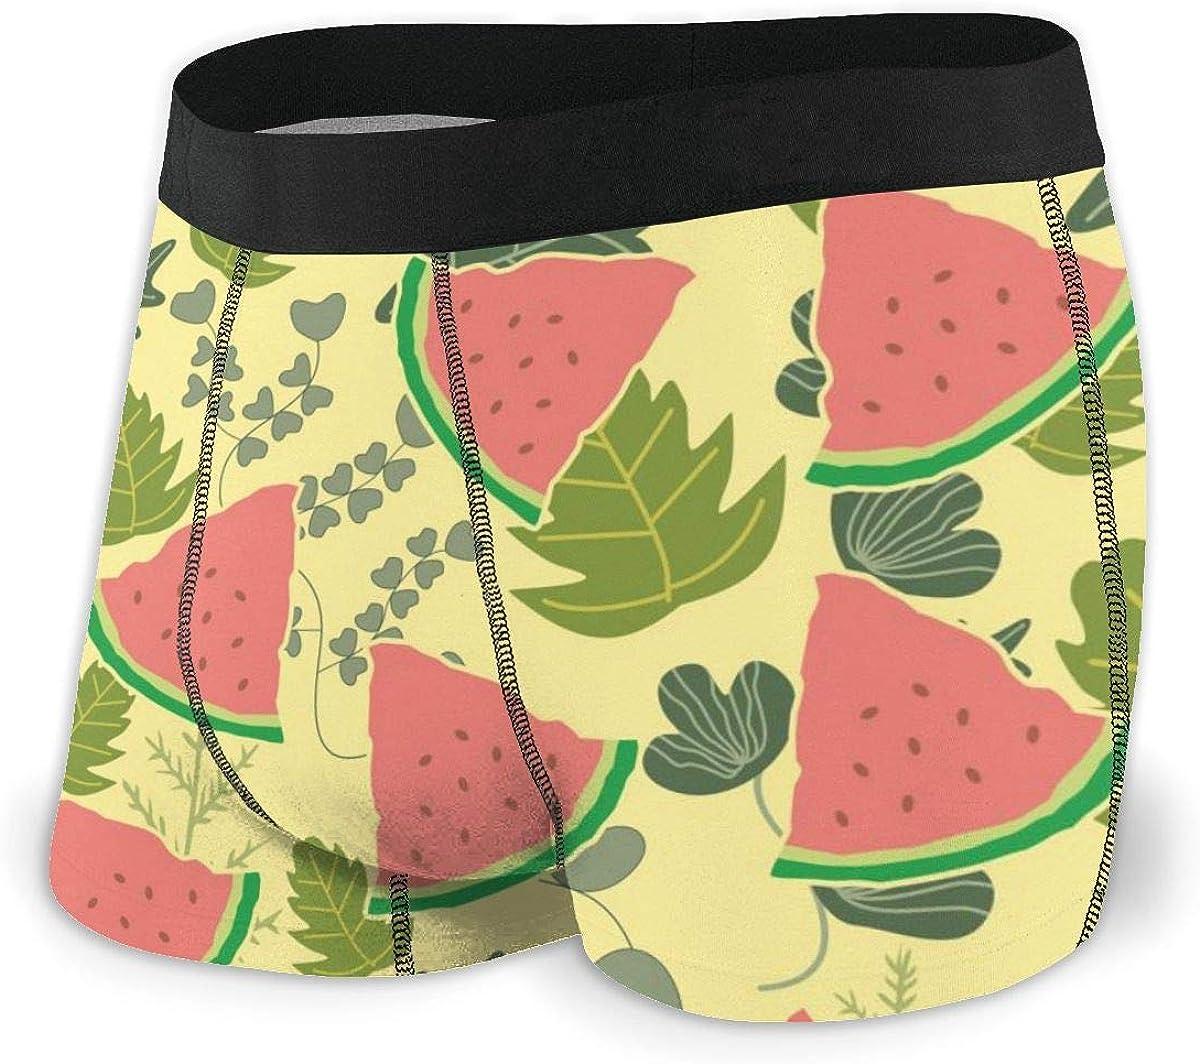 Randolph Wordsworth Mens Boxer Briefs Cute Watermelon Bikini Underwear Stretch Low Rise Trunks Boys